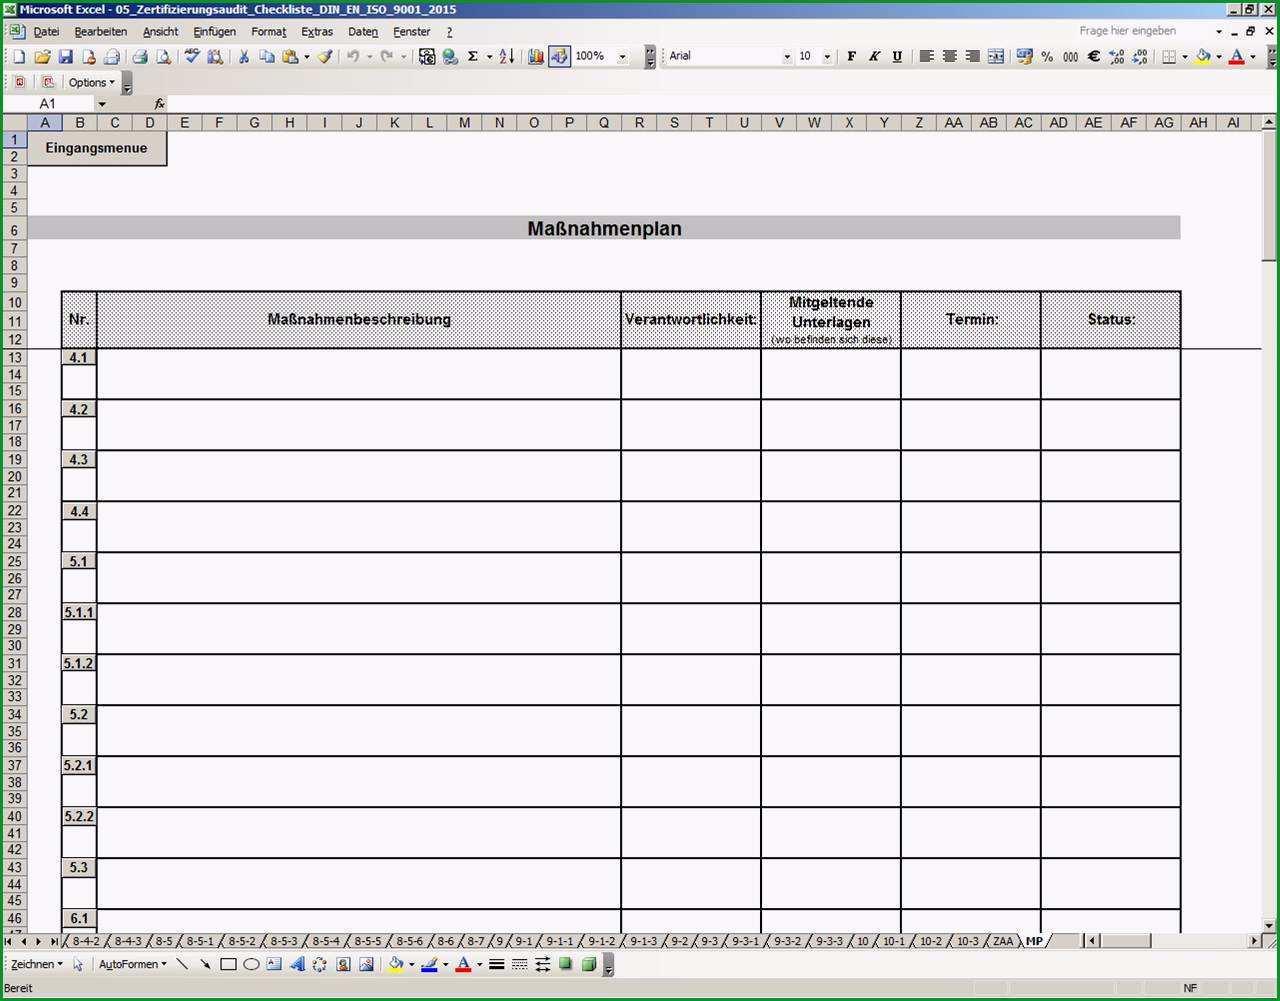 Qualitaetsmanagement ISO 9001 2015 Excel Auditcheckliste